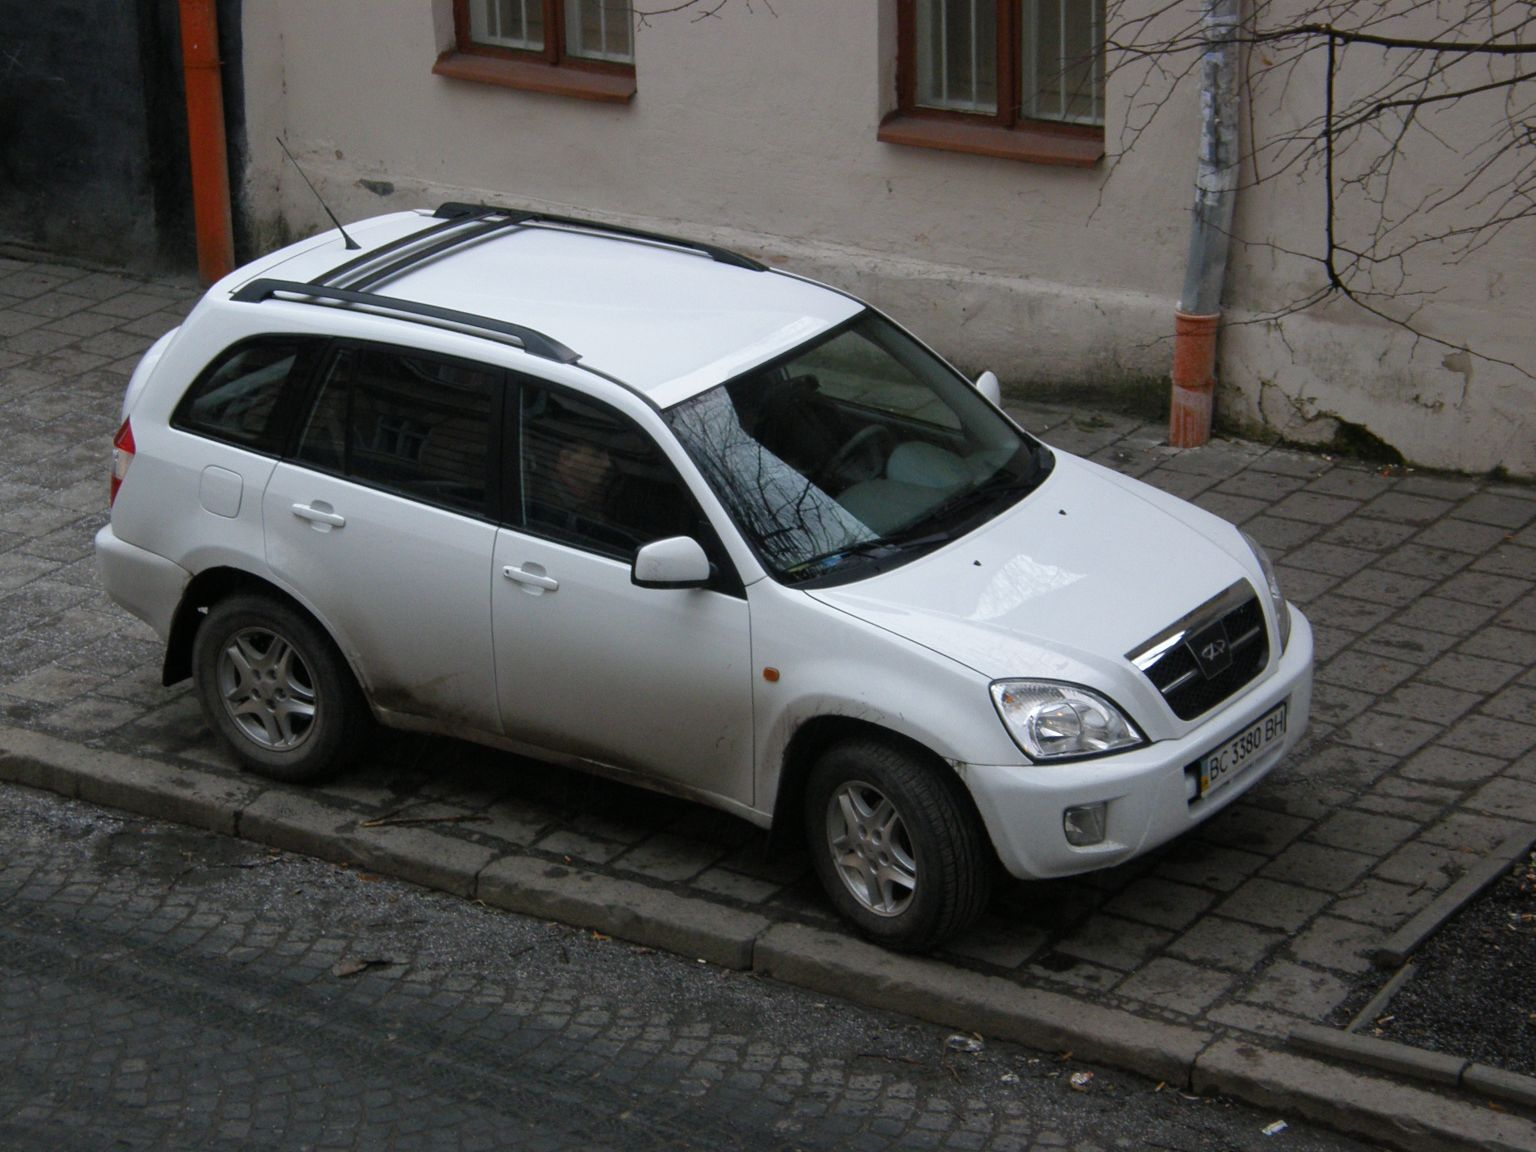 http://images.wikia.com/tractors/images/2/25/Chery_Tiggo_in_Ukraine.jpg